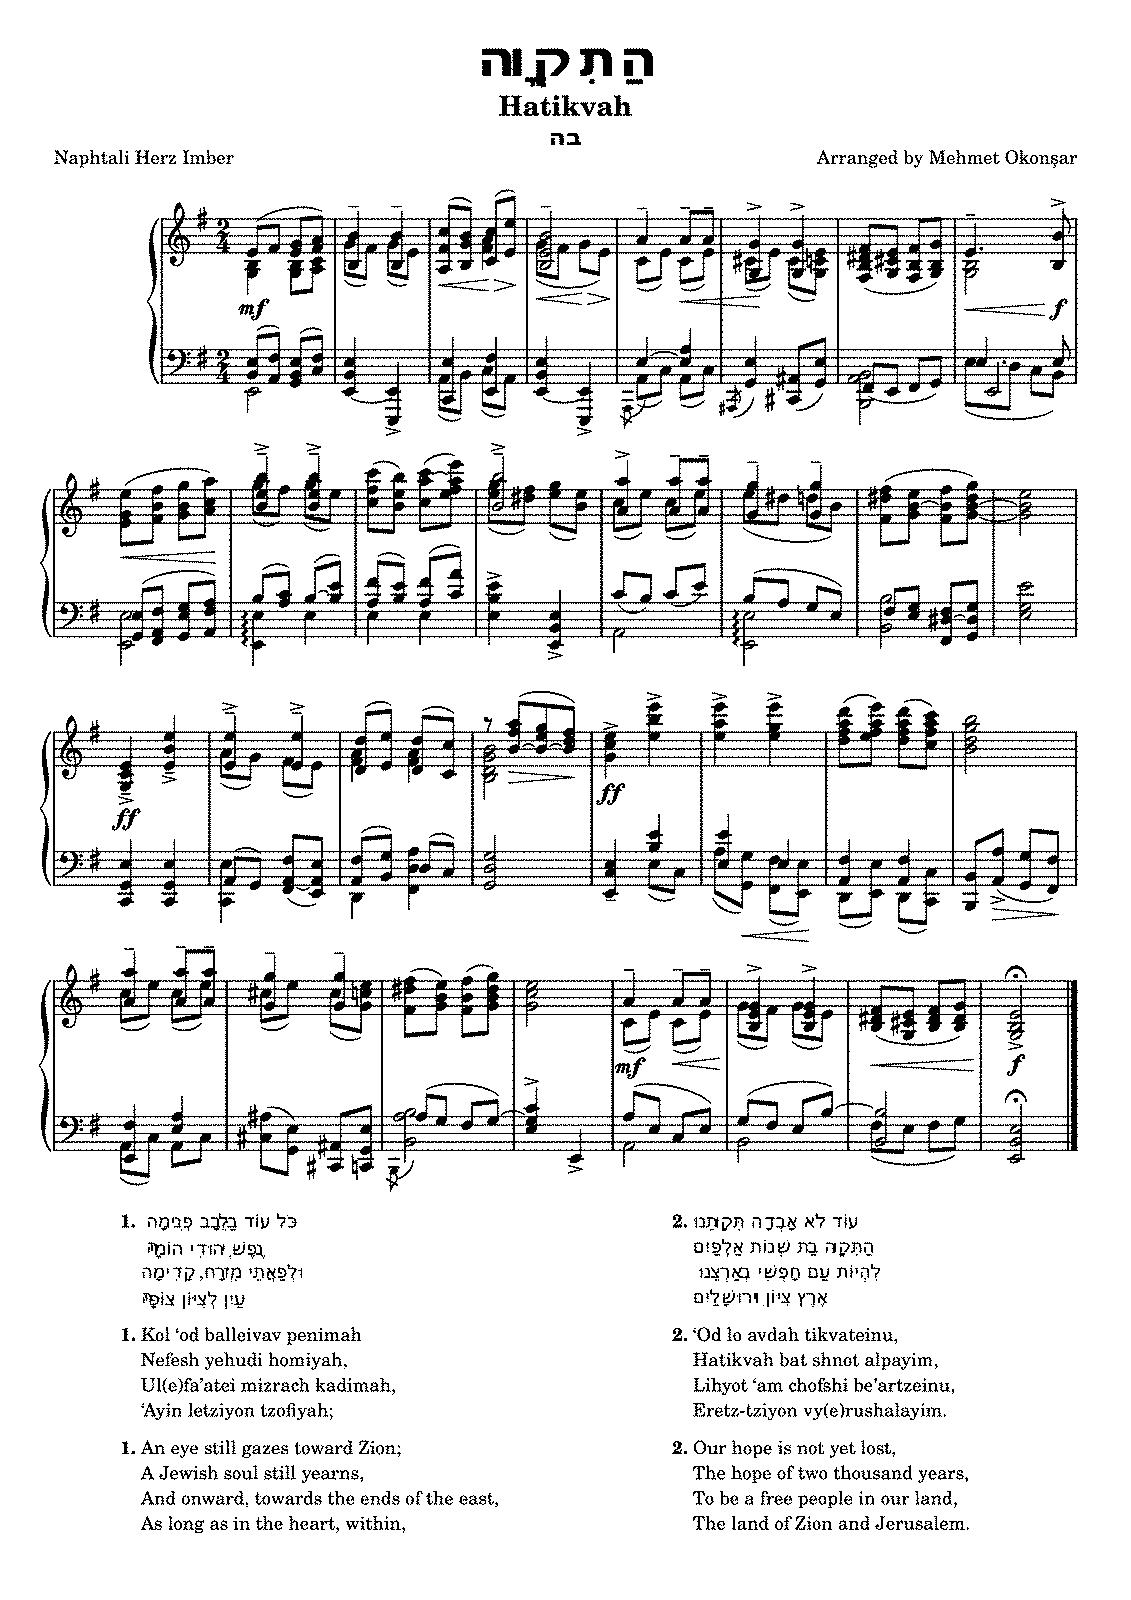 Ational anthem lyrics